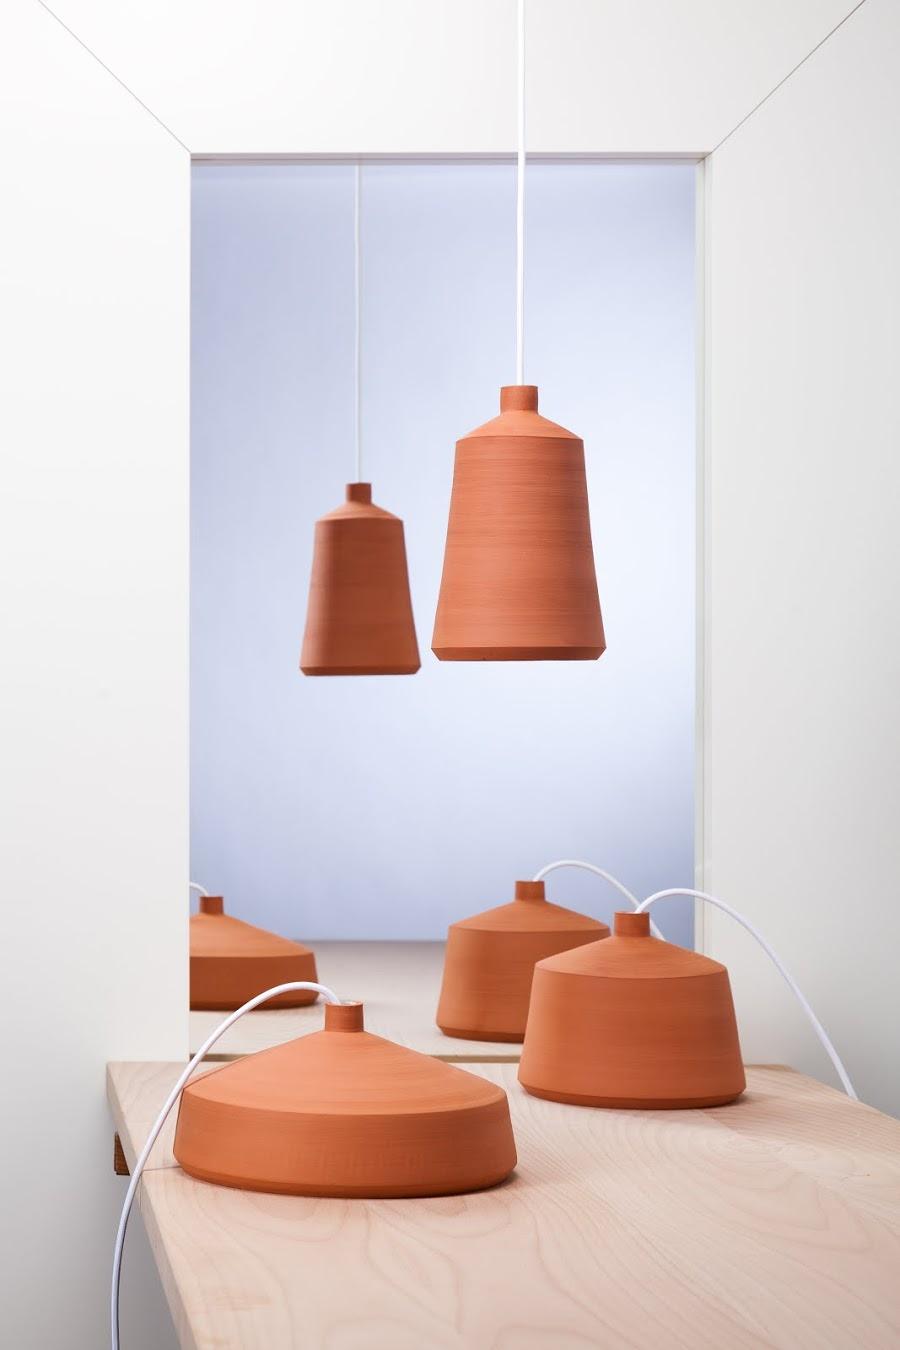 20140910 pott flame studio12976.jpg